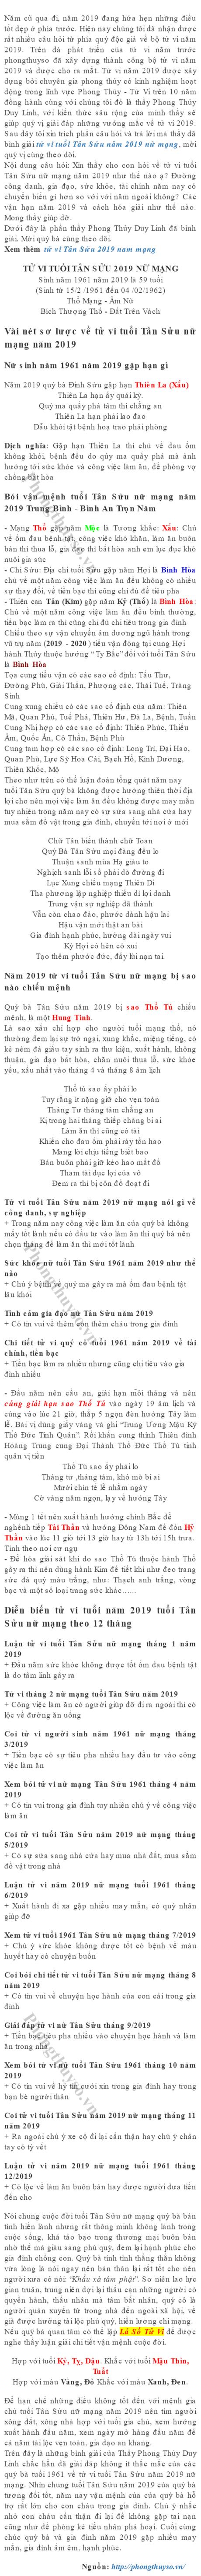 tu-vi-tuoi-tan-suu-nam-2019-nu-mang